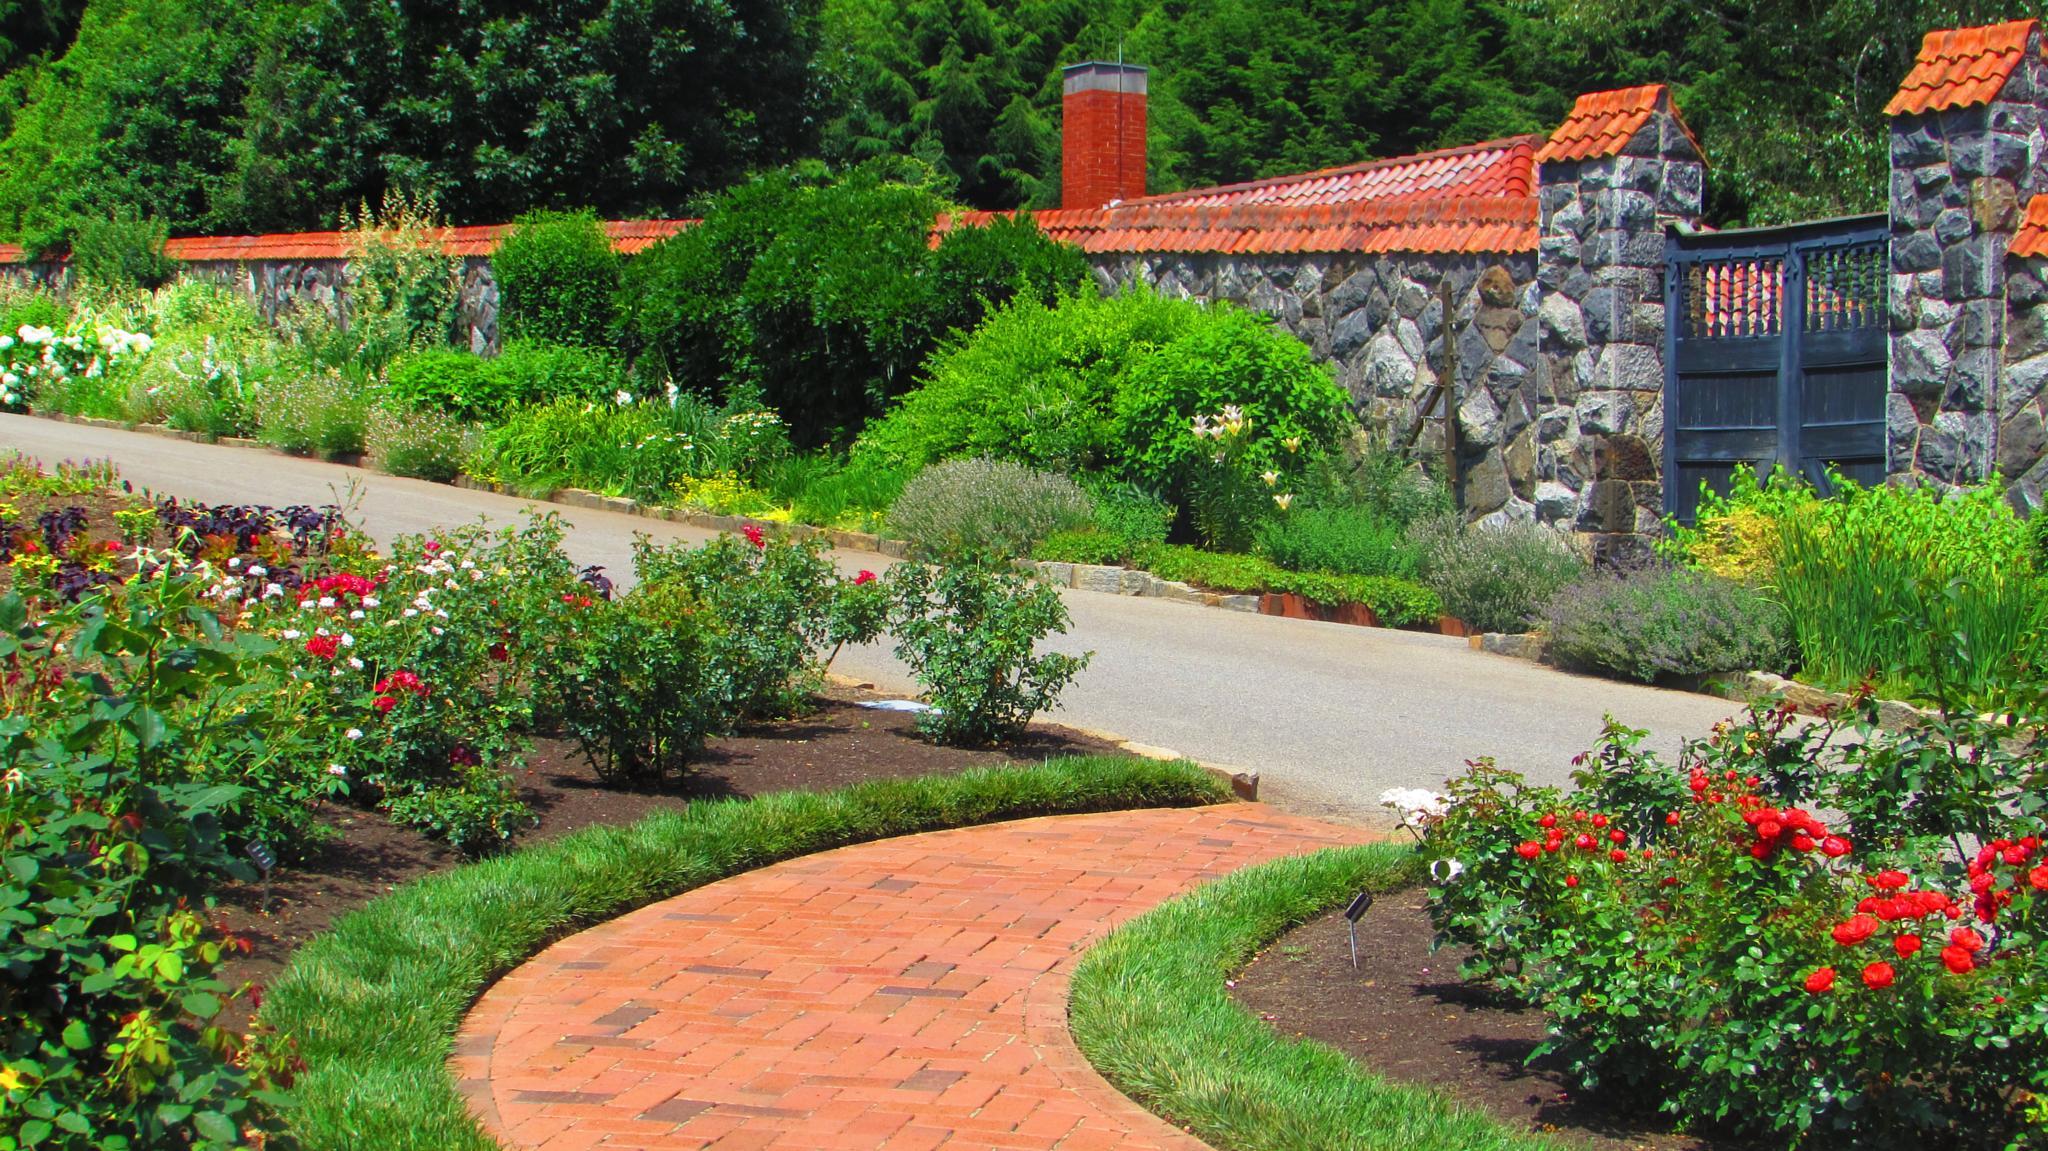 Biltmore gardens by candi.stanley.7